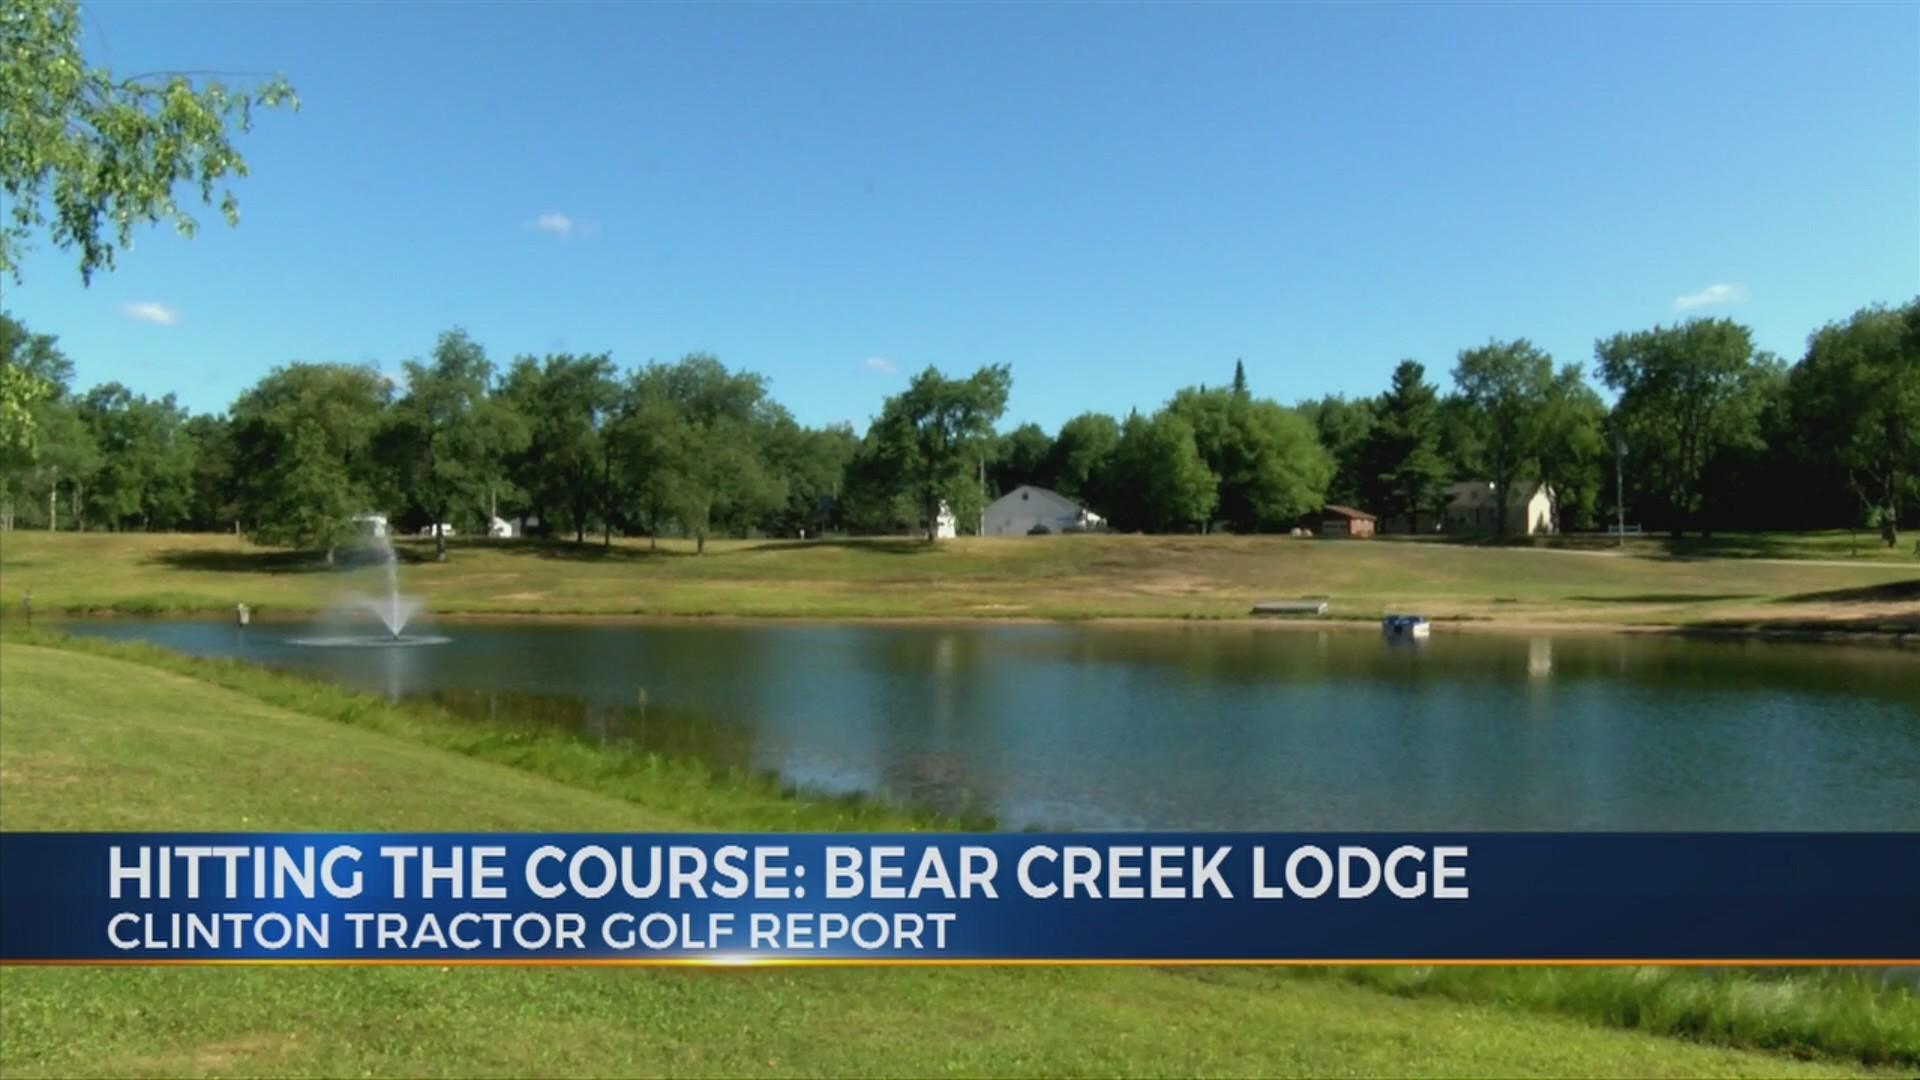 Clinton Tractor Golf Report: Bear Creek Lodge 7/12/18